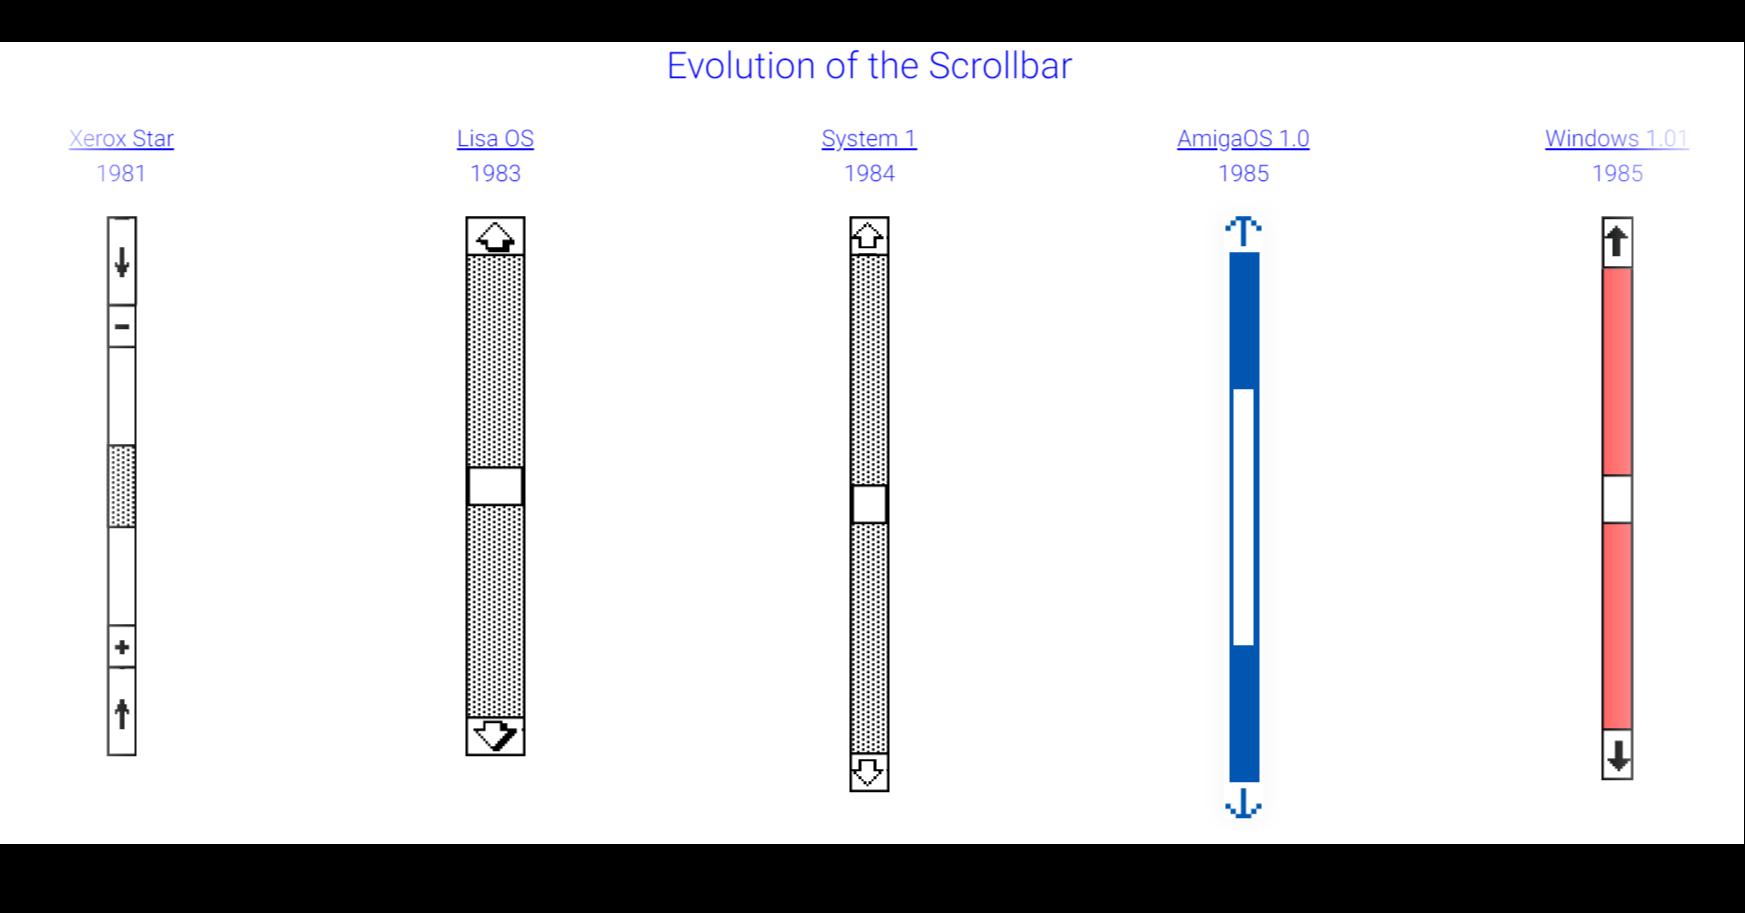 照片中提到了Evolution of the Scrollbar、AmigaOS 1.0、Windows 1.01,包含了圖、產品、角度、產品設計、線